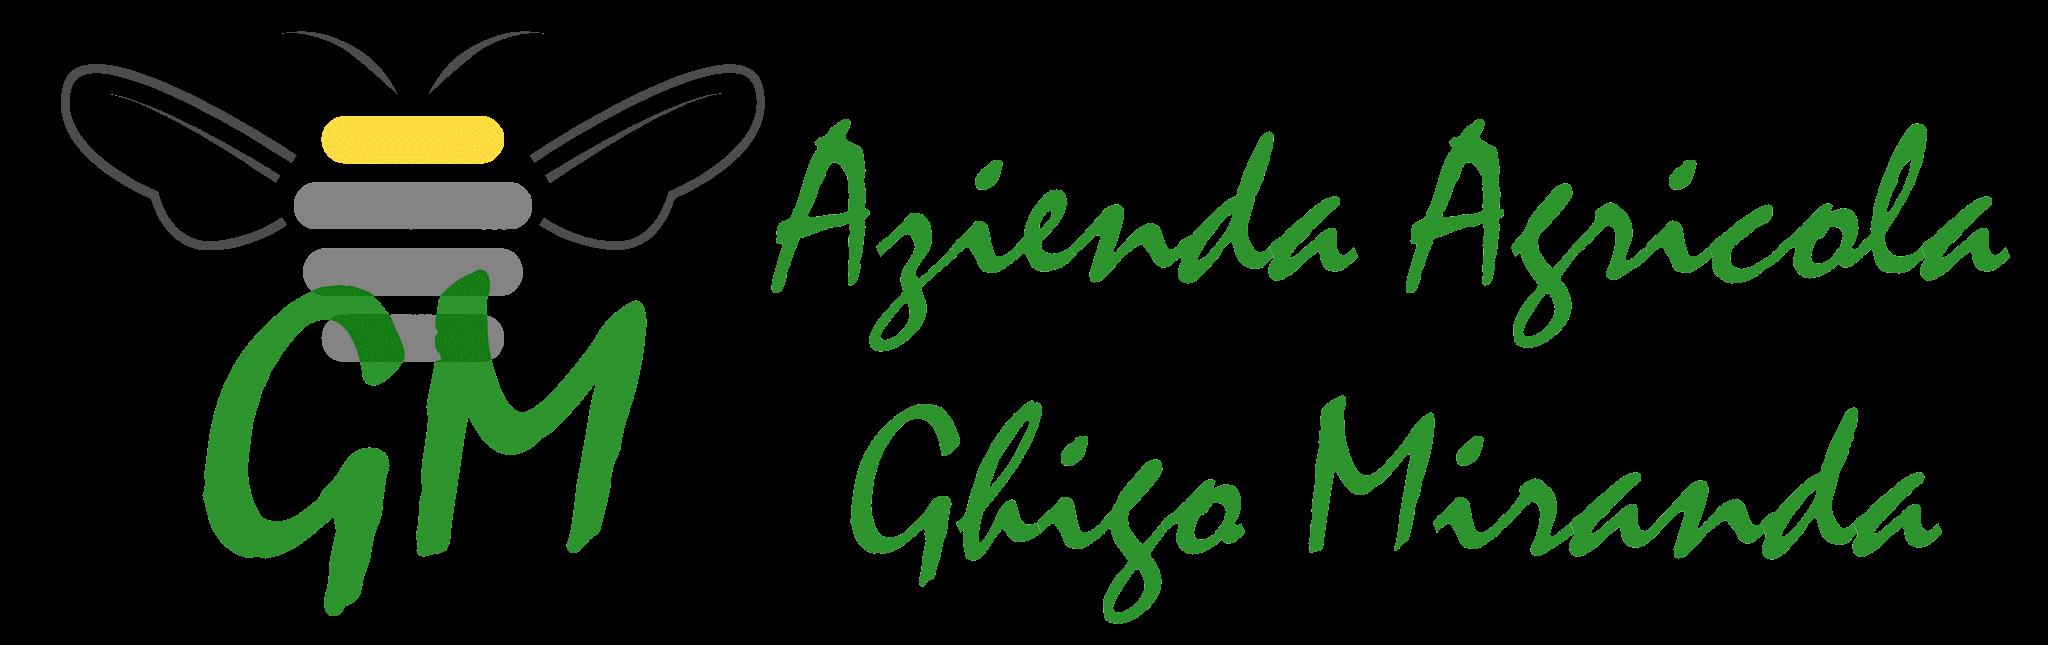 Azienda agricola Ghigo Miranda